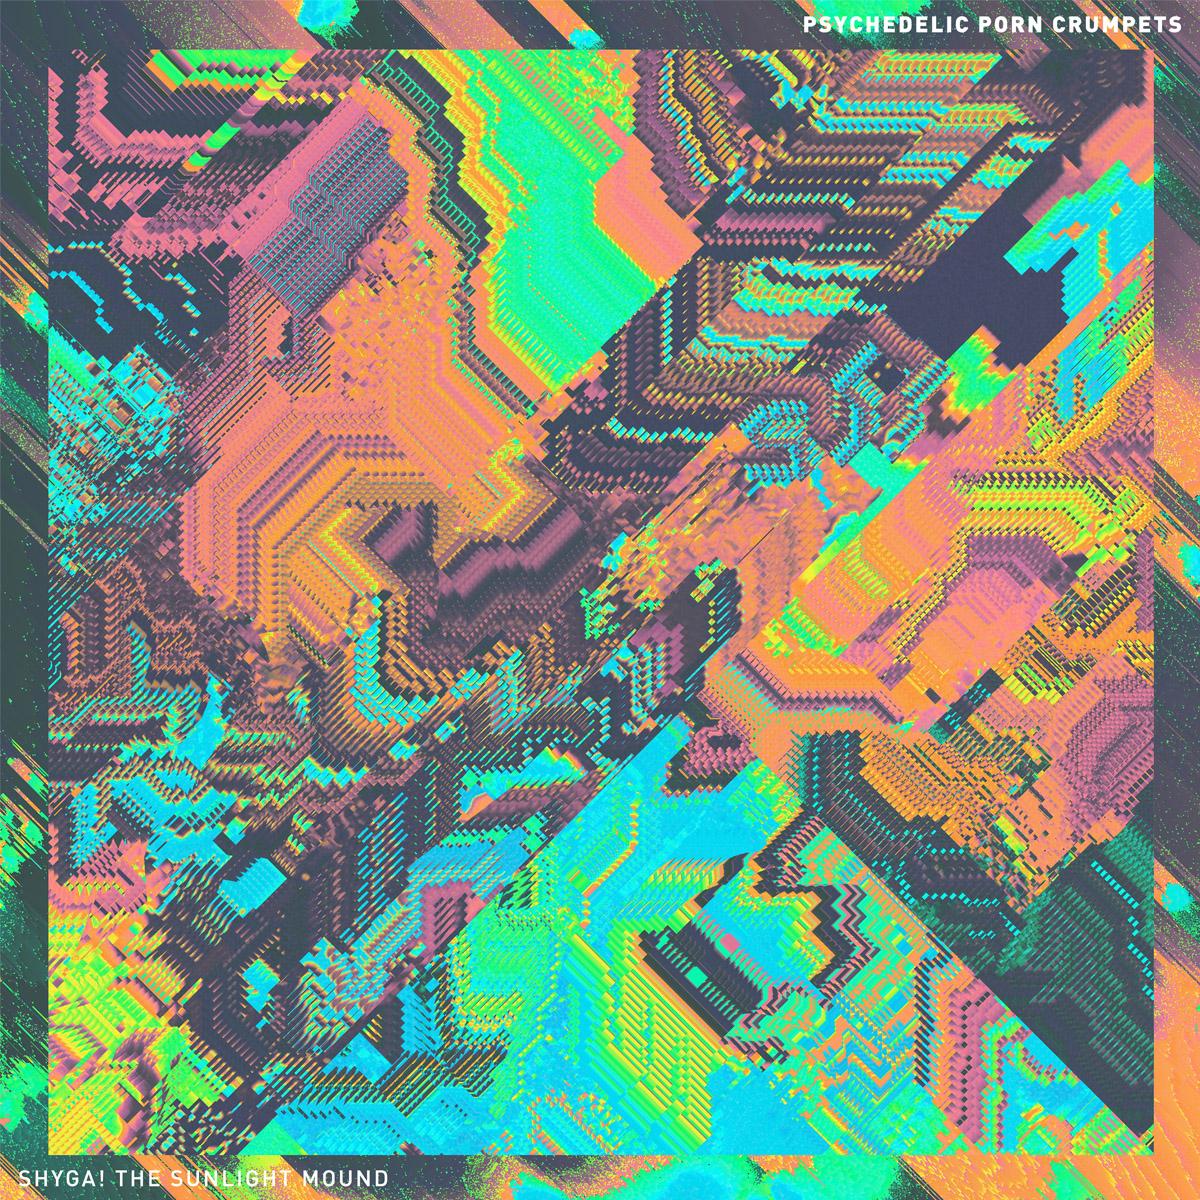 Psychedelic Porn Crumpets new album Shyga the Sunlight Mound 2021